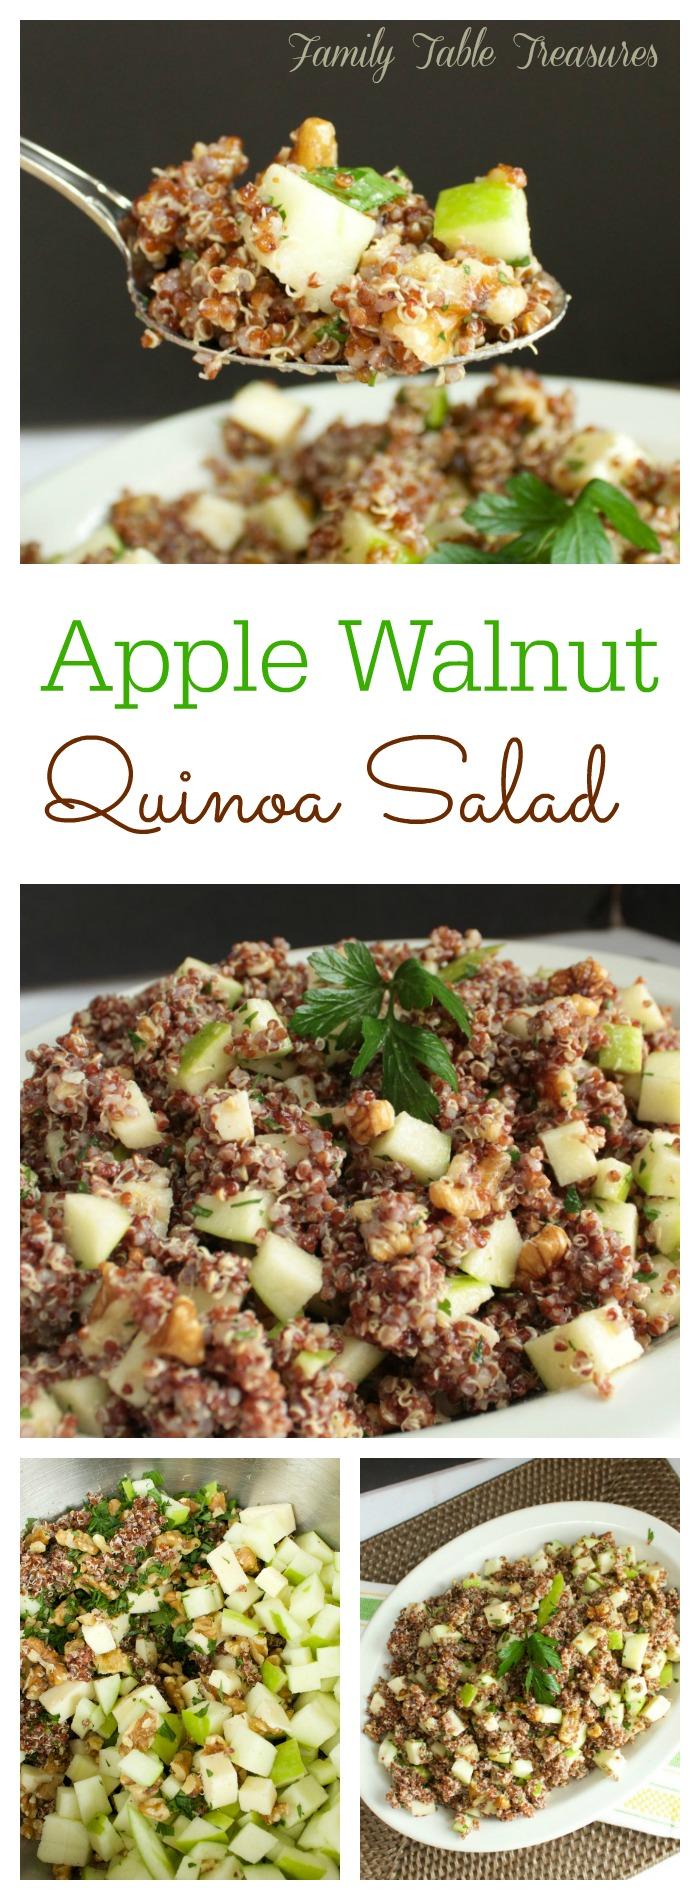 Apple Walnut Quinoa Salad